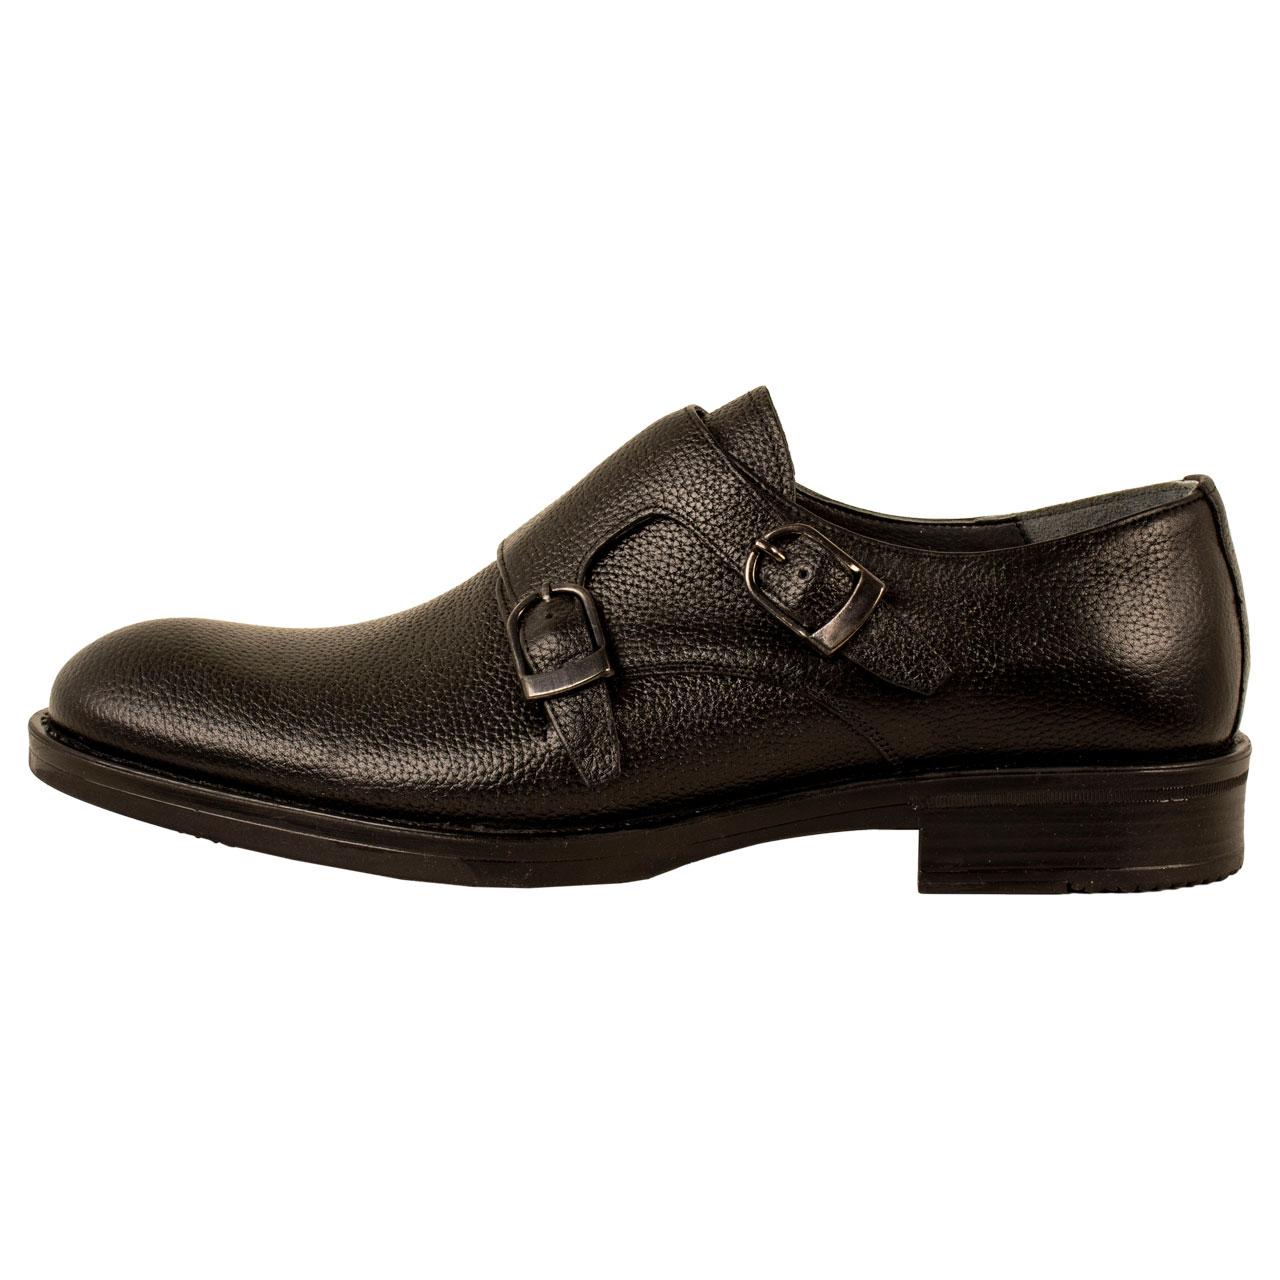 کفش مردانه پارینه چرم مدل SHO169